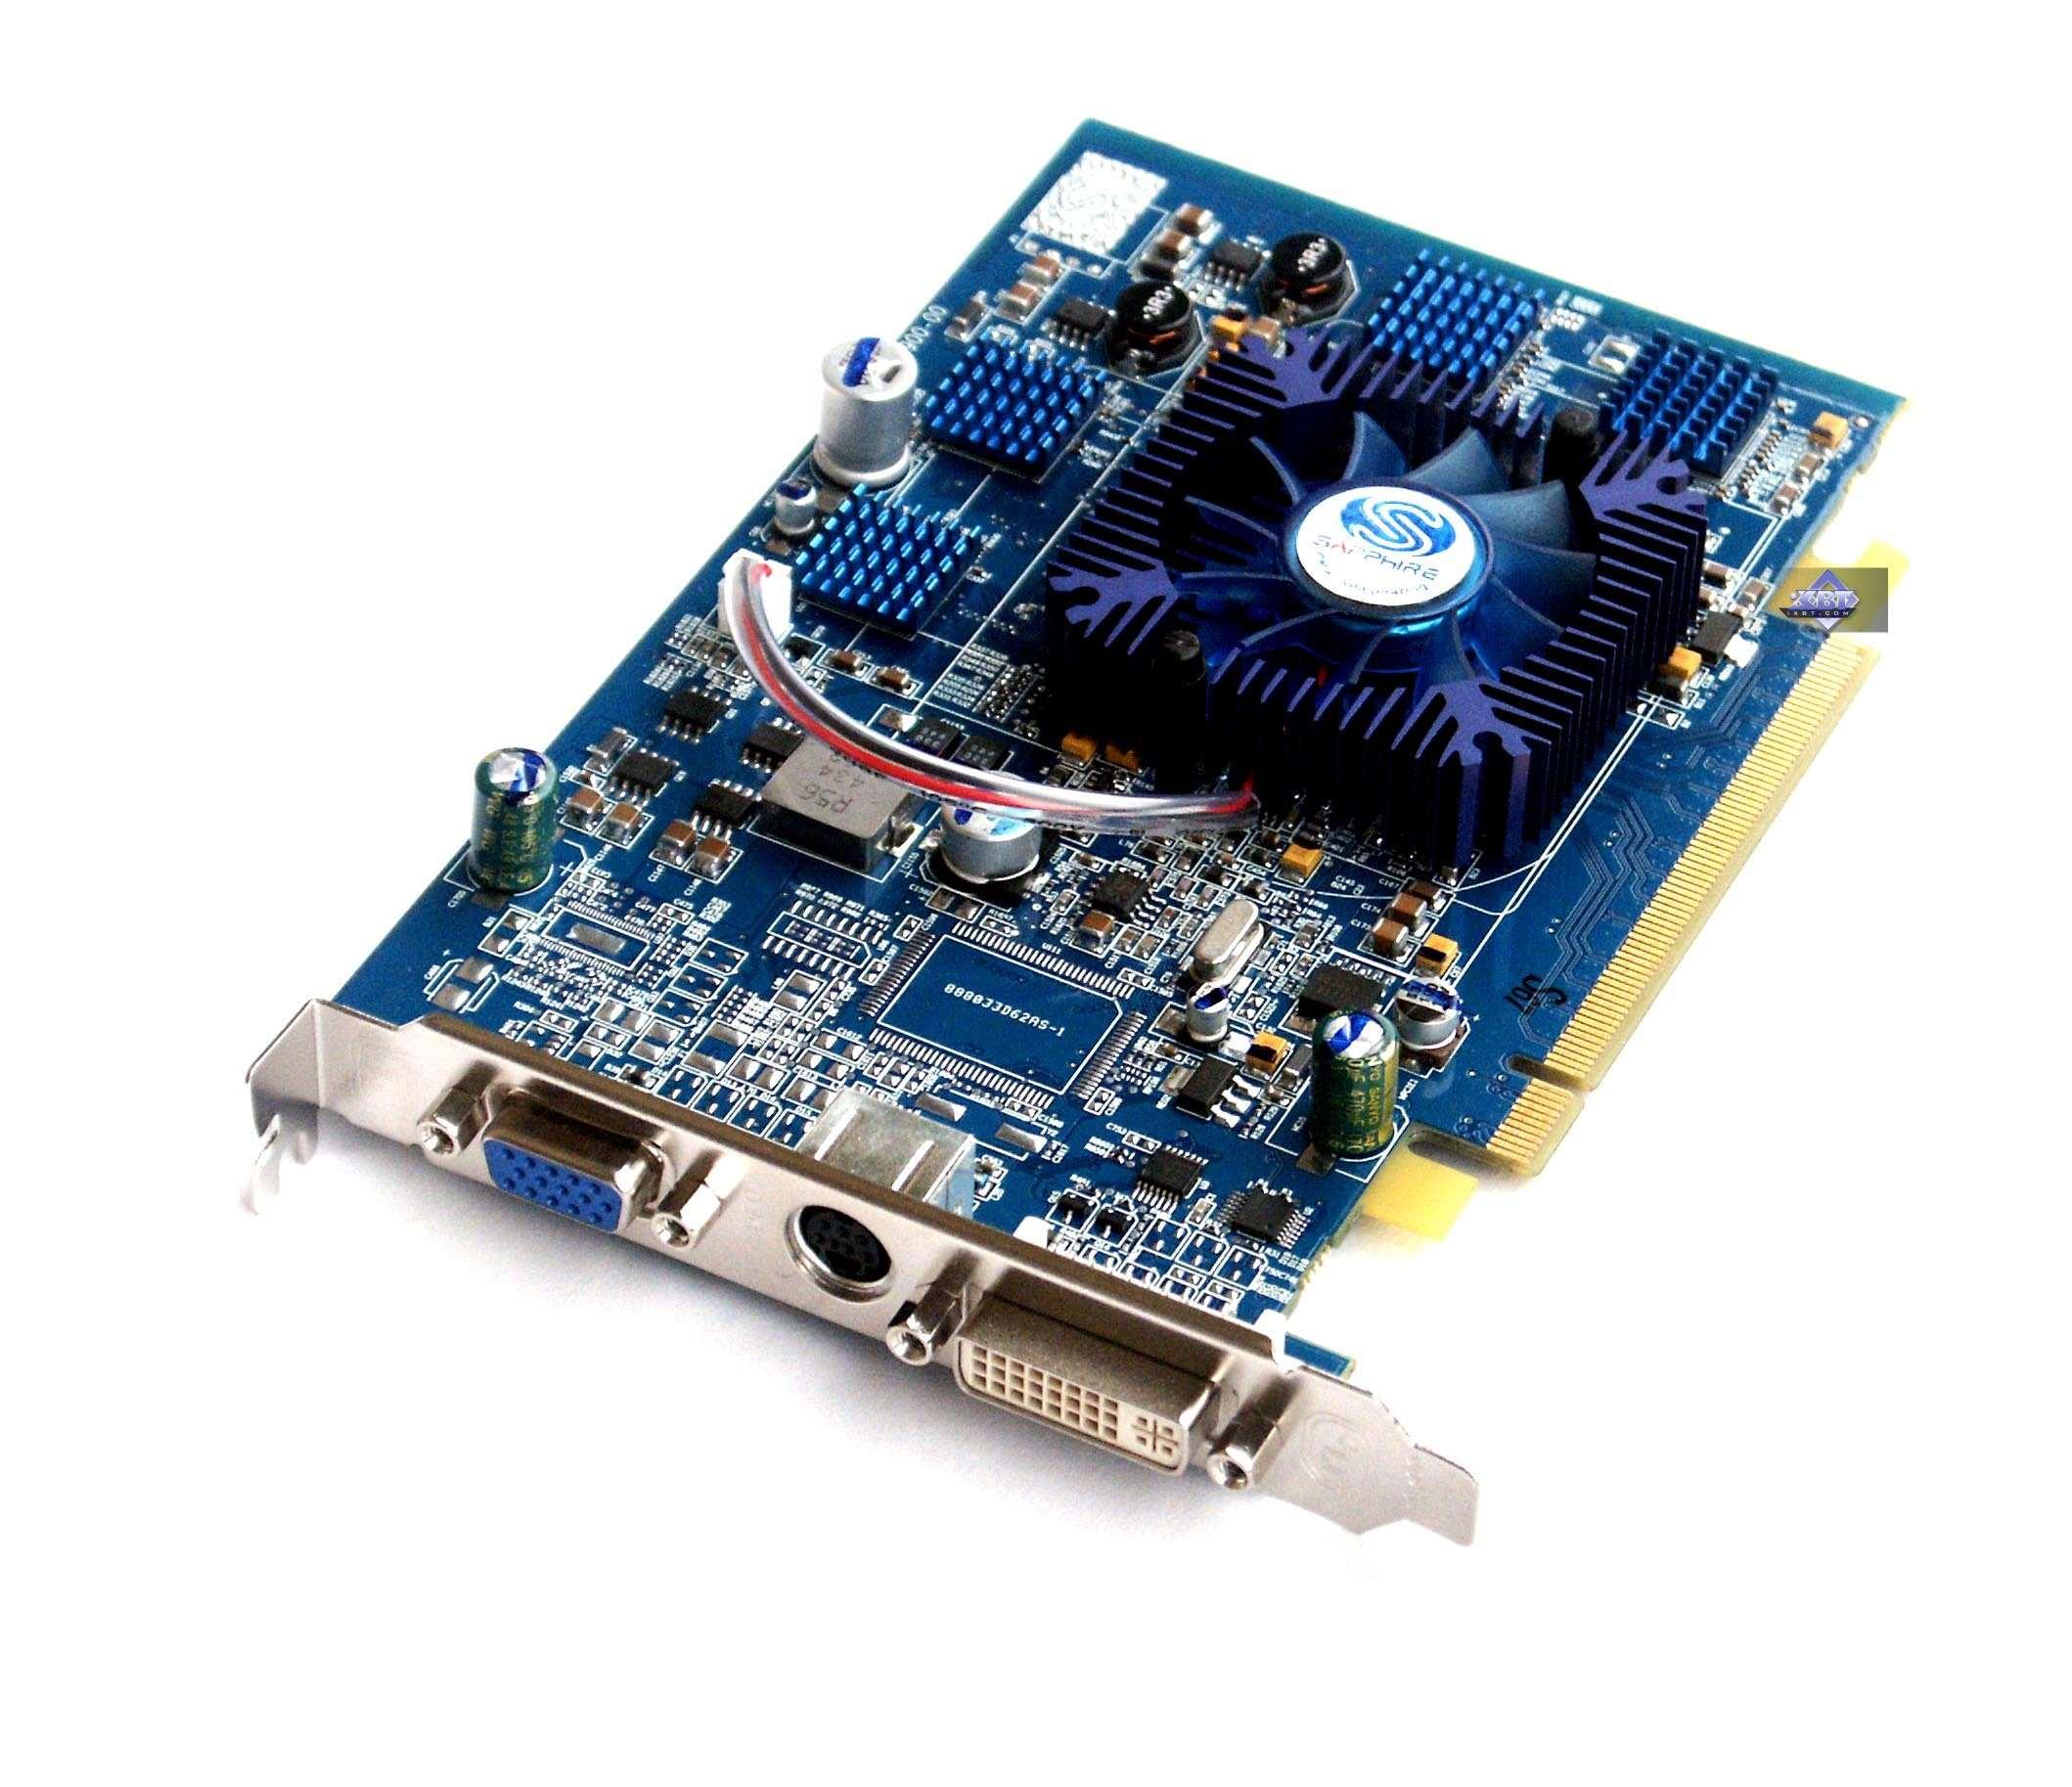 Ati radeon x1600 series driver xp zip by ovblownyro issuu.